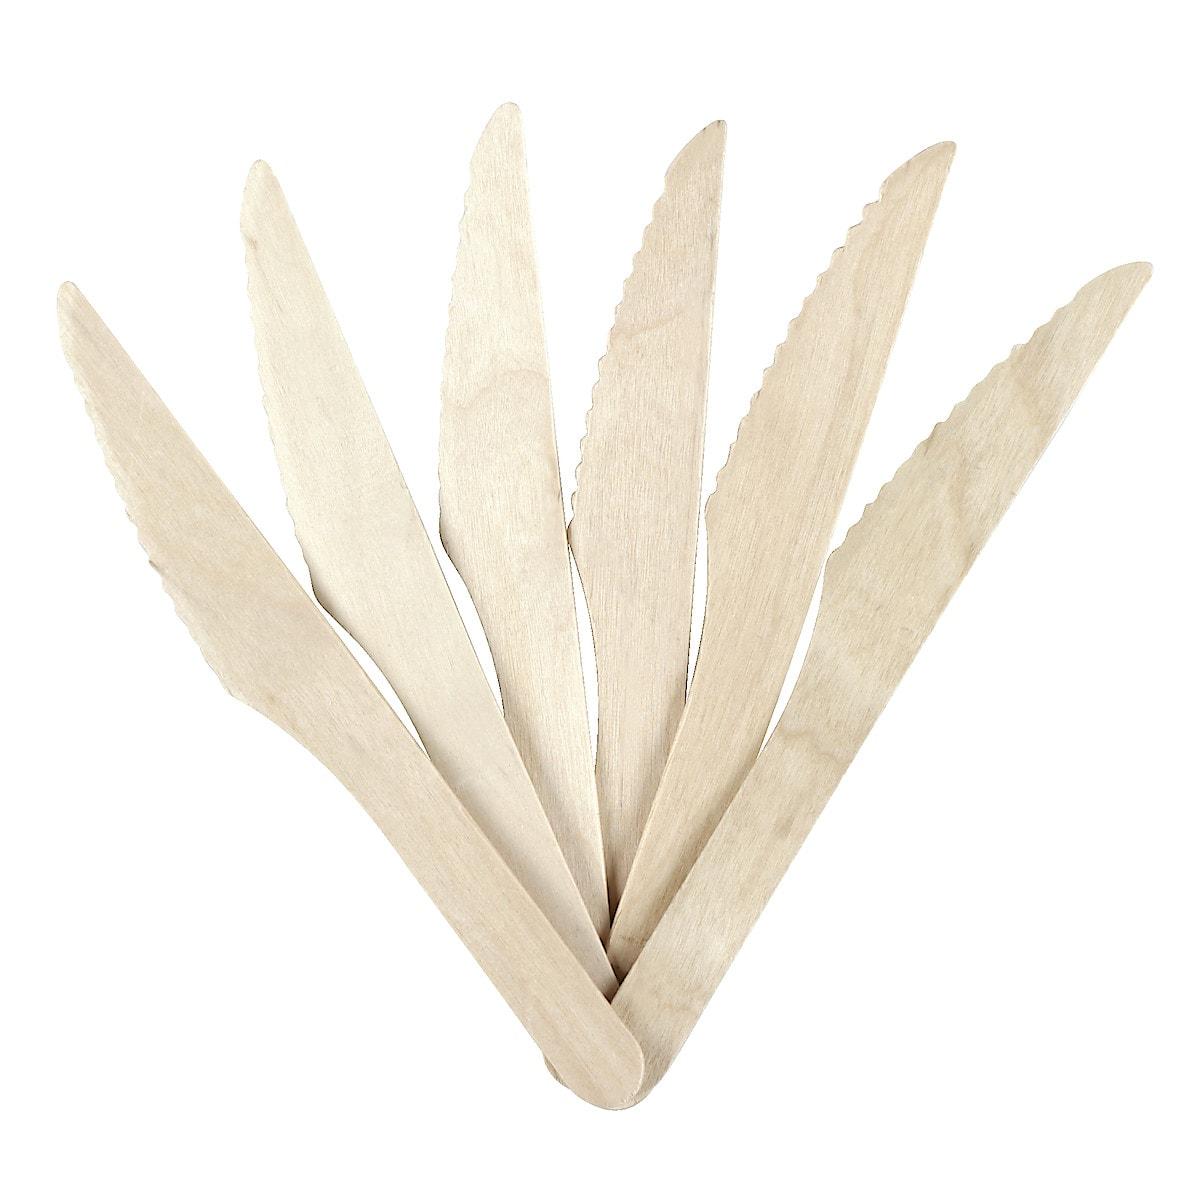 Kertakäyttöaterimet bambu, 18 kpl